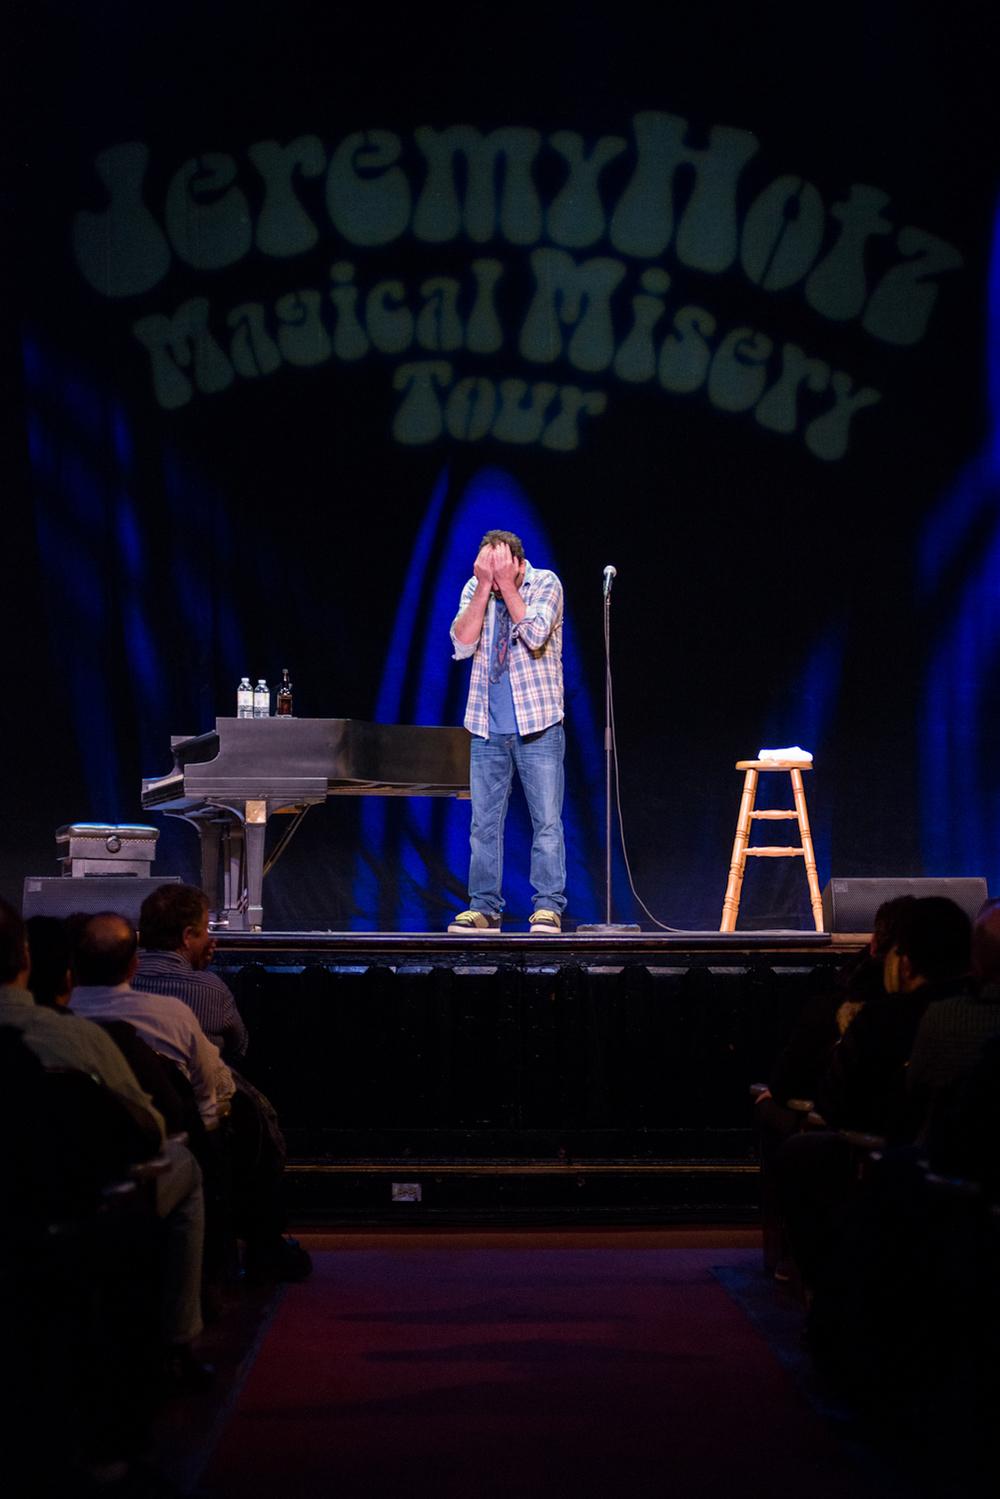 Jeremy Hotz, Magical Misery Tour, Toronto 2013